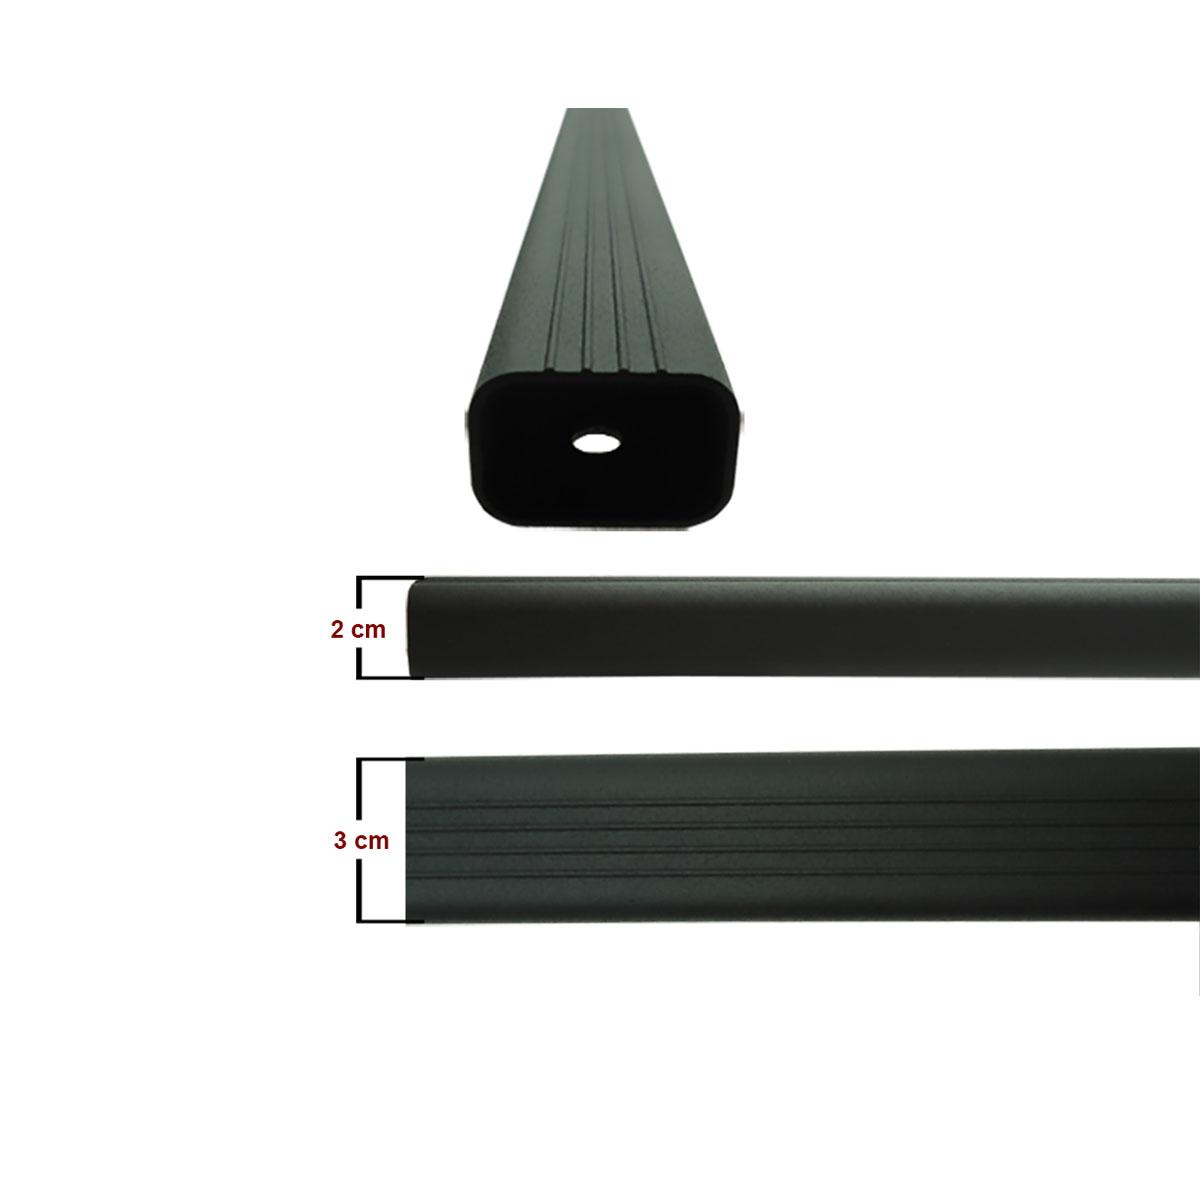 Travessa rack de teto alumínio preta Idea 2006 a 2016 kit 3 peças